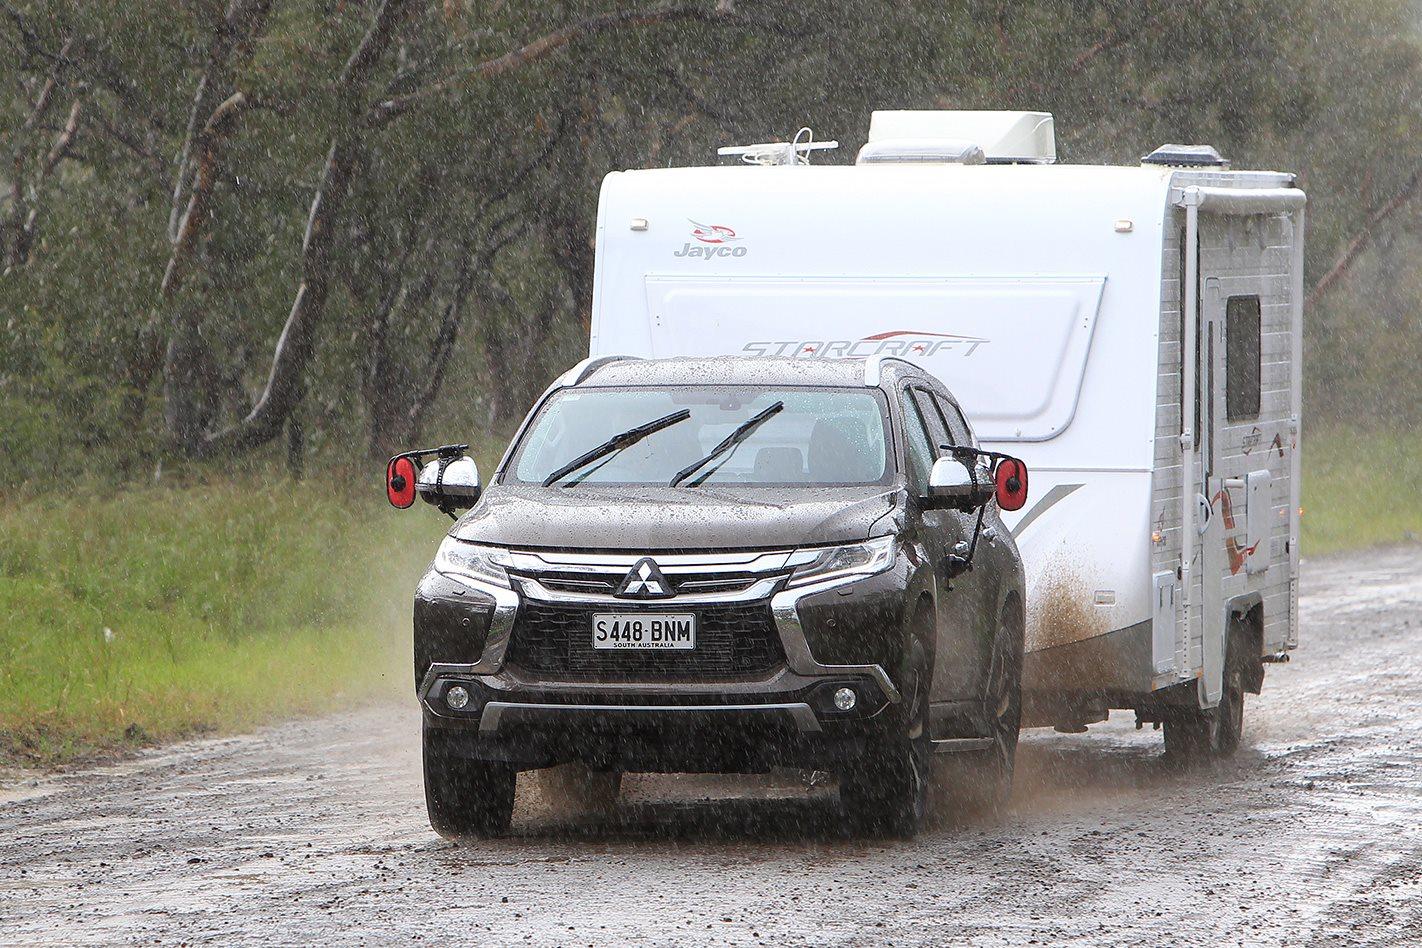 2017 Mitsubishi Pajero Sport Exceed in Rain